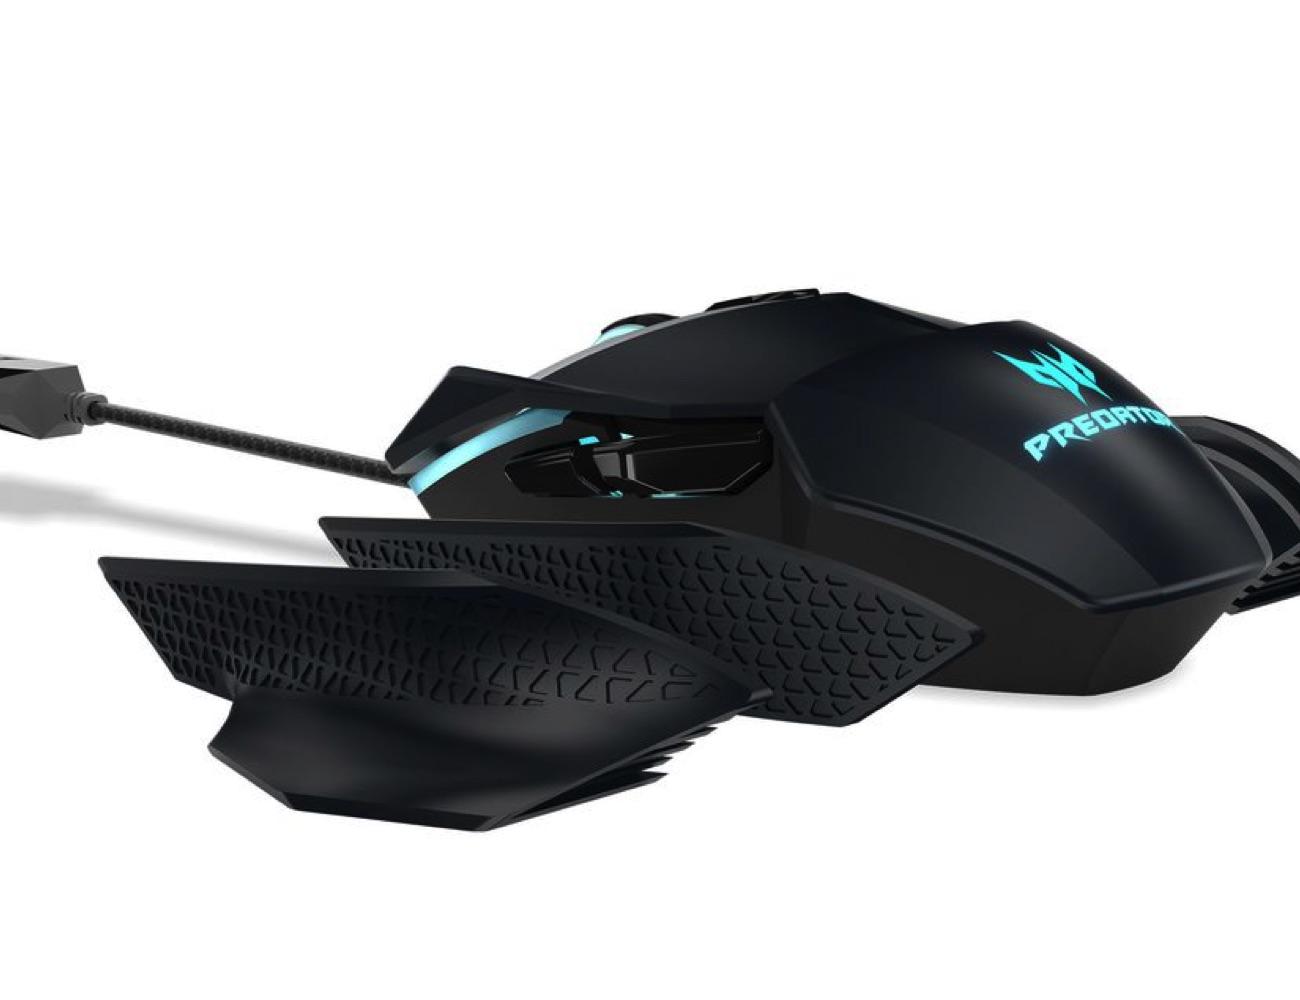 Acer Predator Cestus 500 Mouse